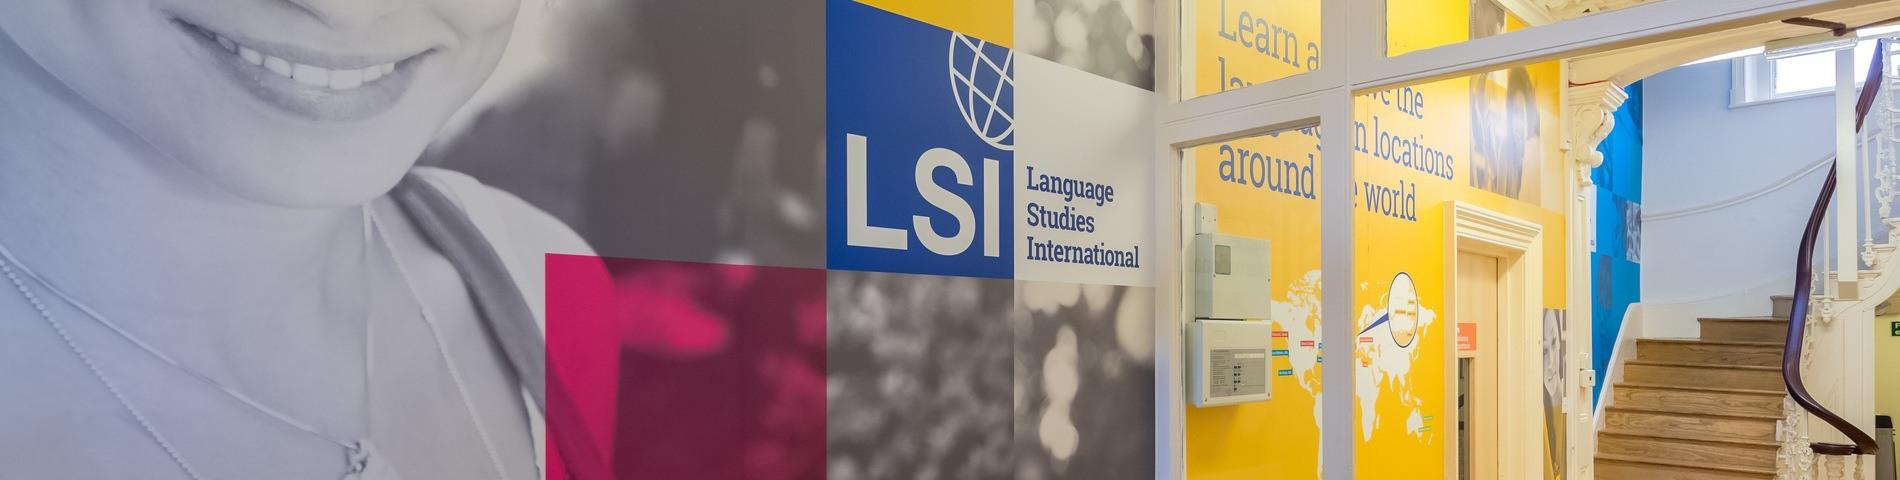 LSI - Language Studies International - Hampstead picture 1